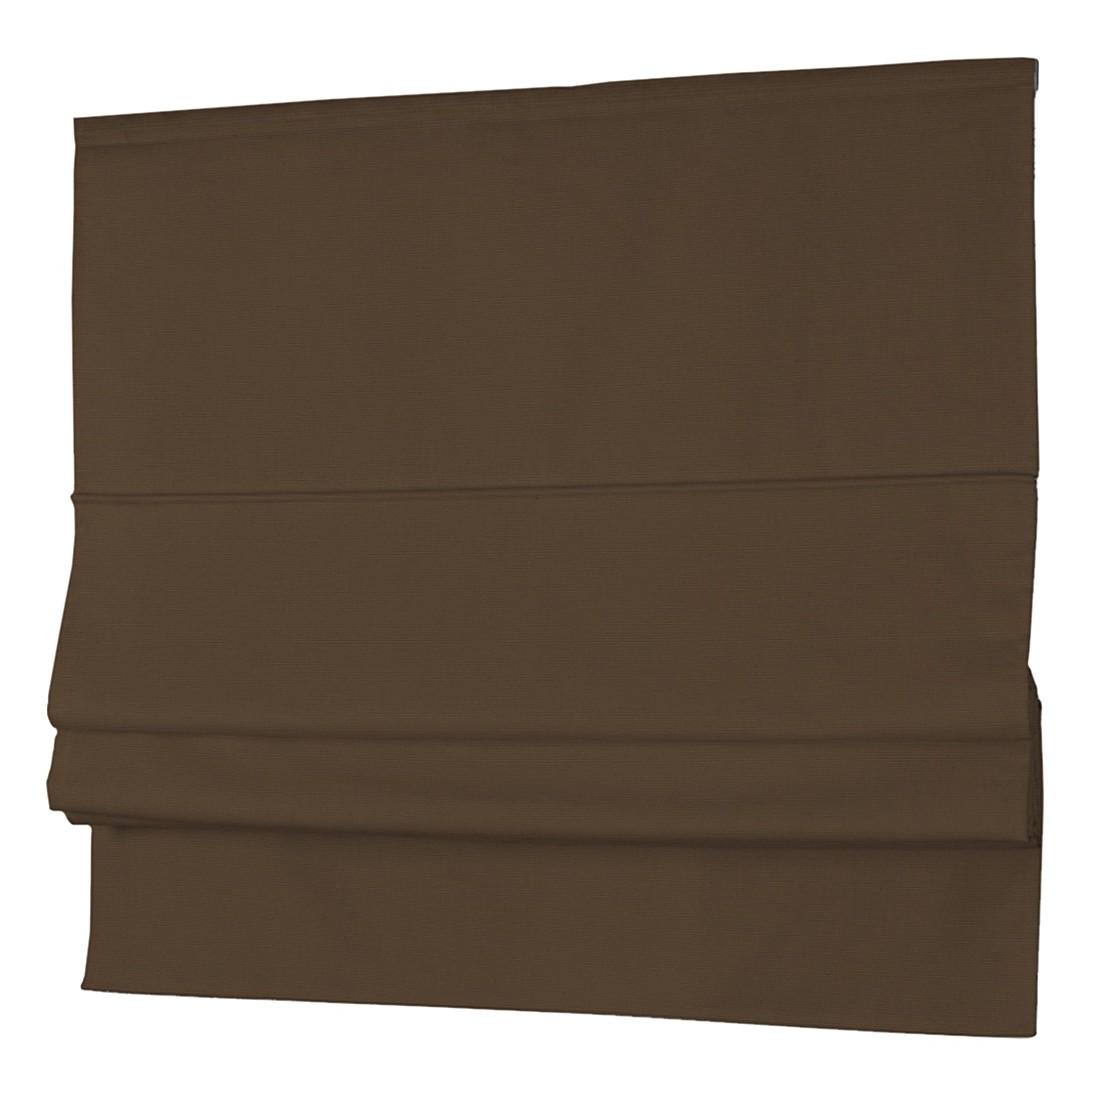 Raffrollo Cotton Panama – Braun / Kaffeebraun – 130 x 170 cm, Dekoria jetzt kaufen